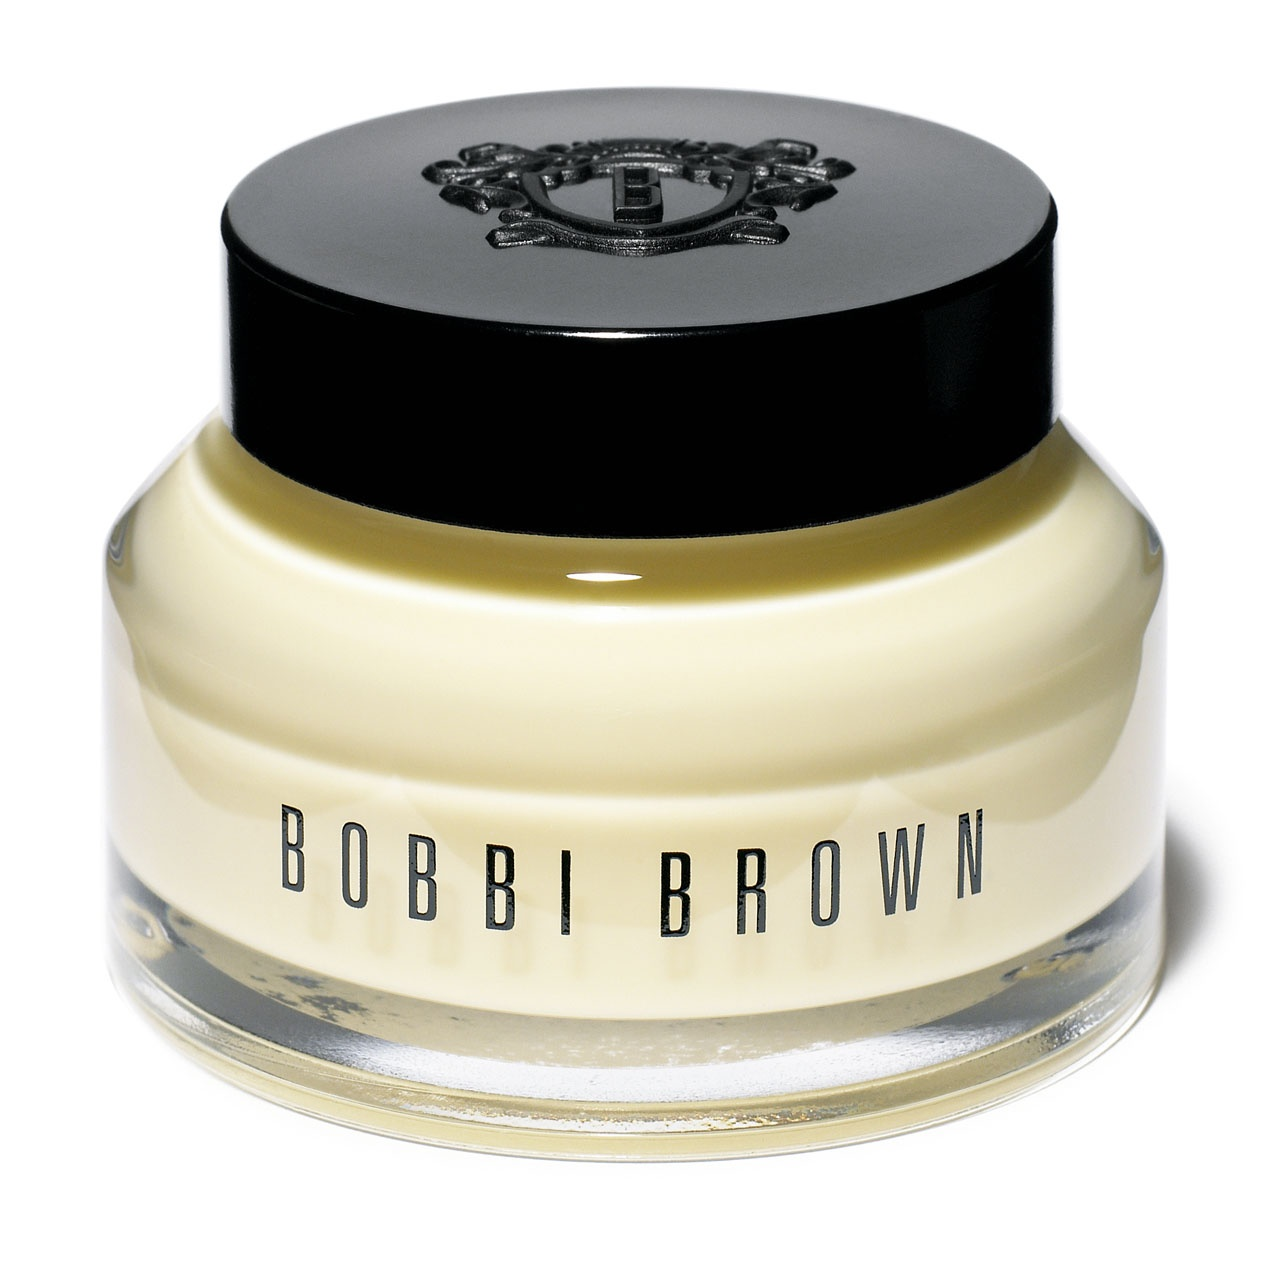 Bobbi Brown Vitamin Enriched Face Base, 50 ml